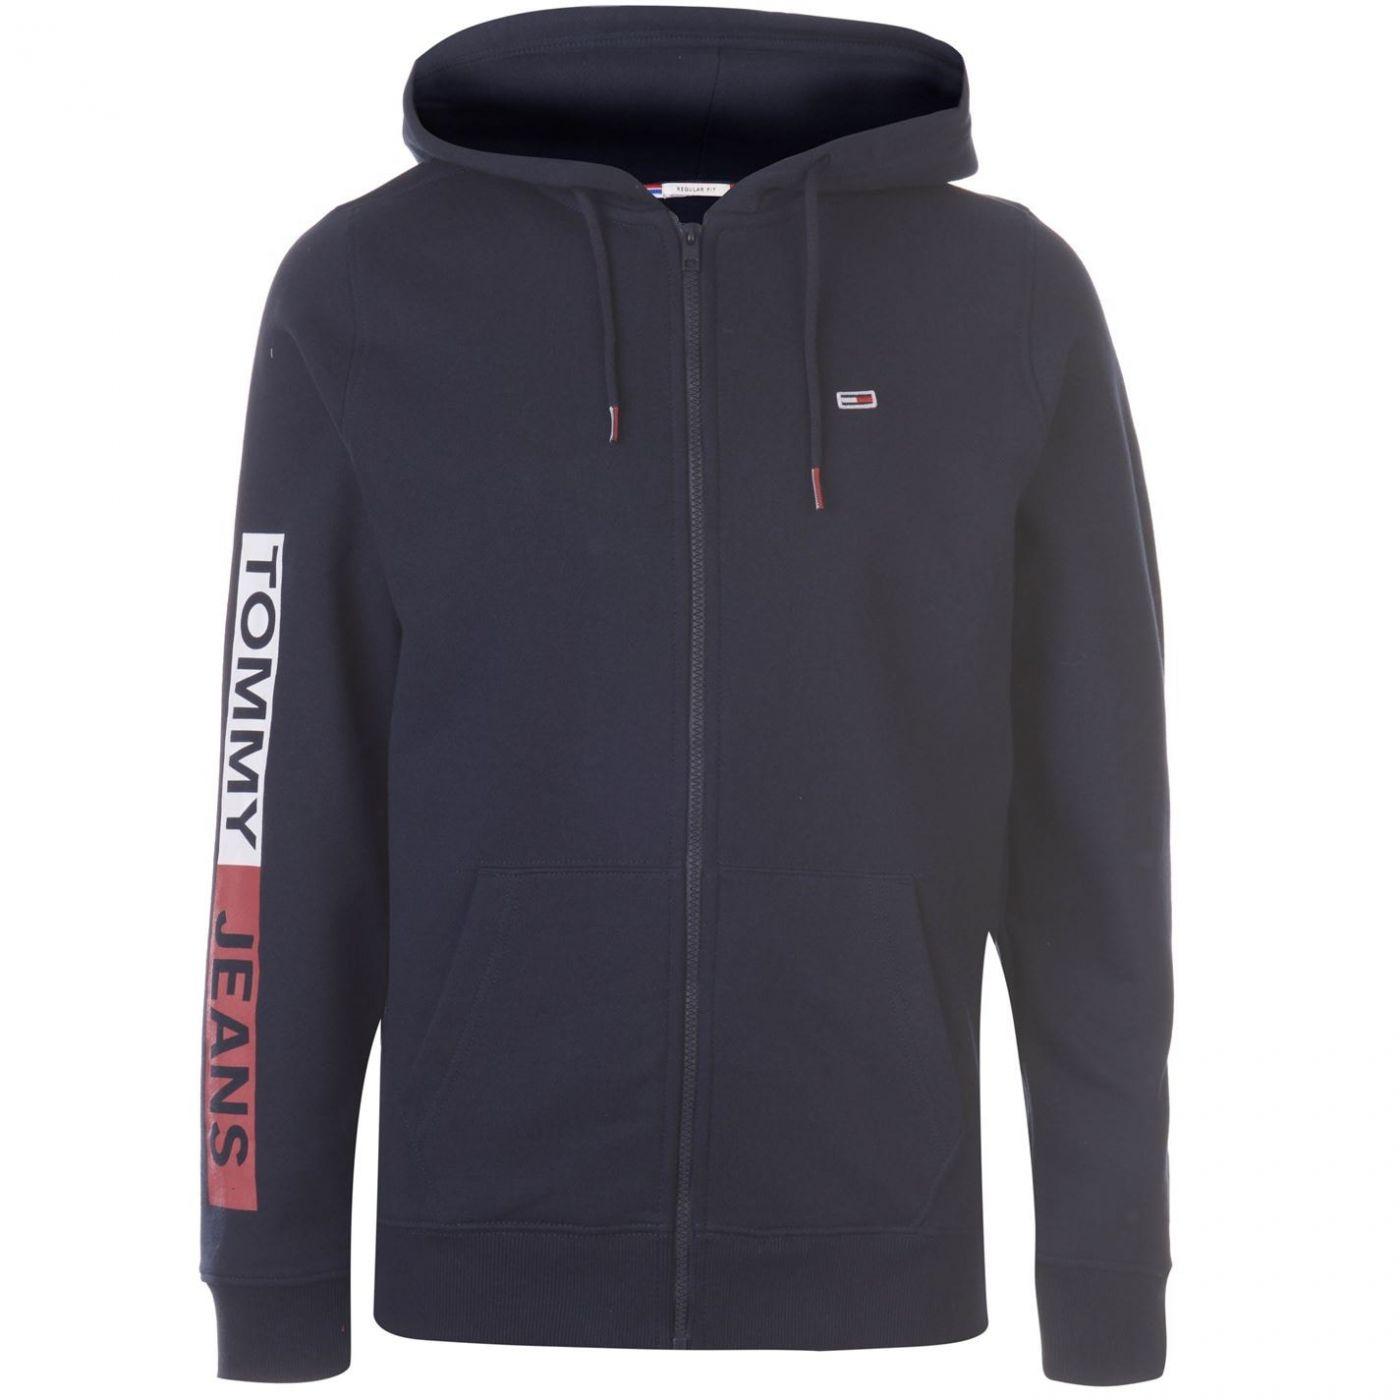 Tommy Jeans Essentials Graphic Zip Hoodie